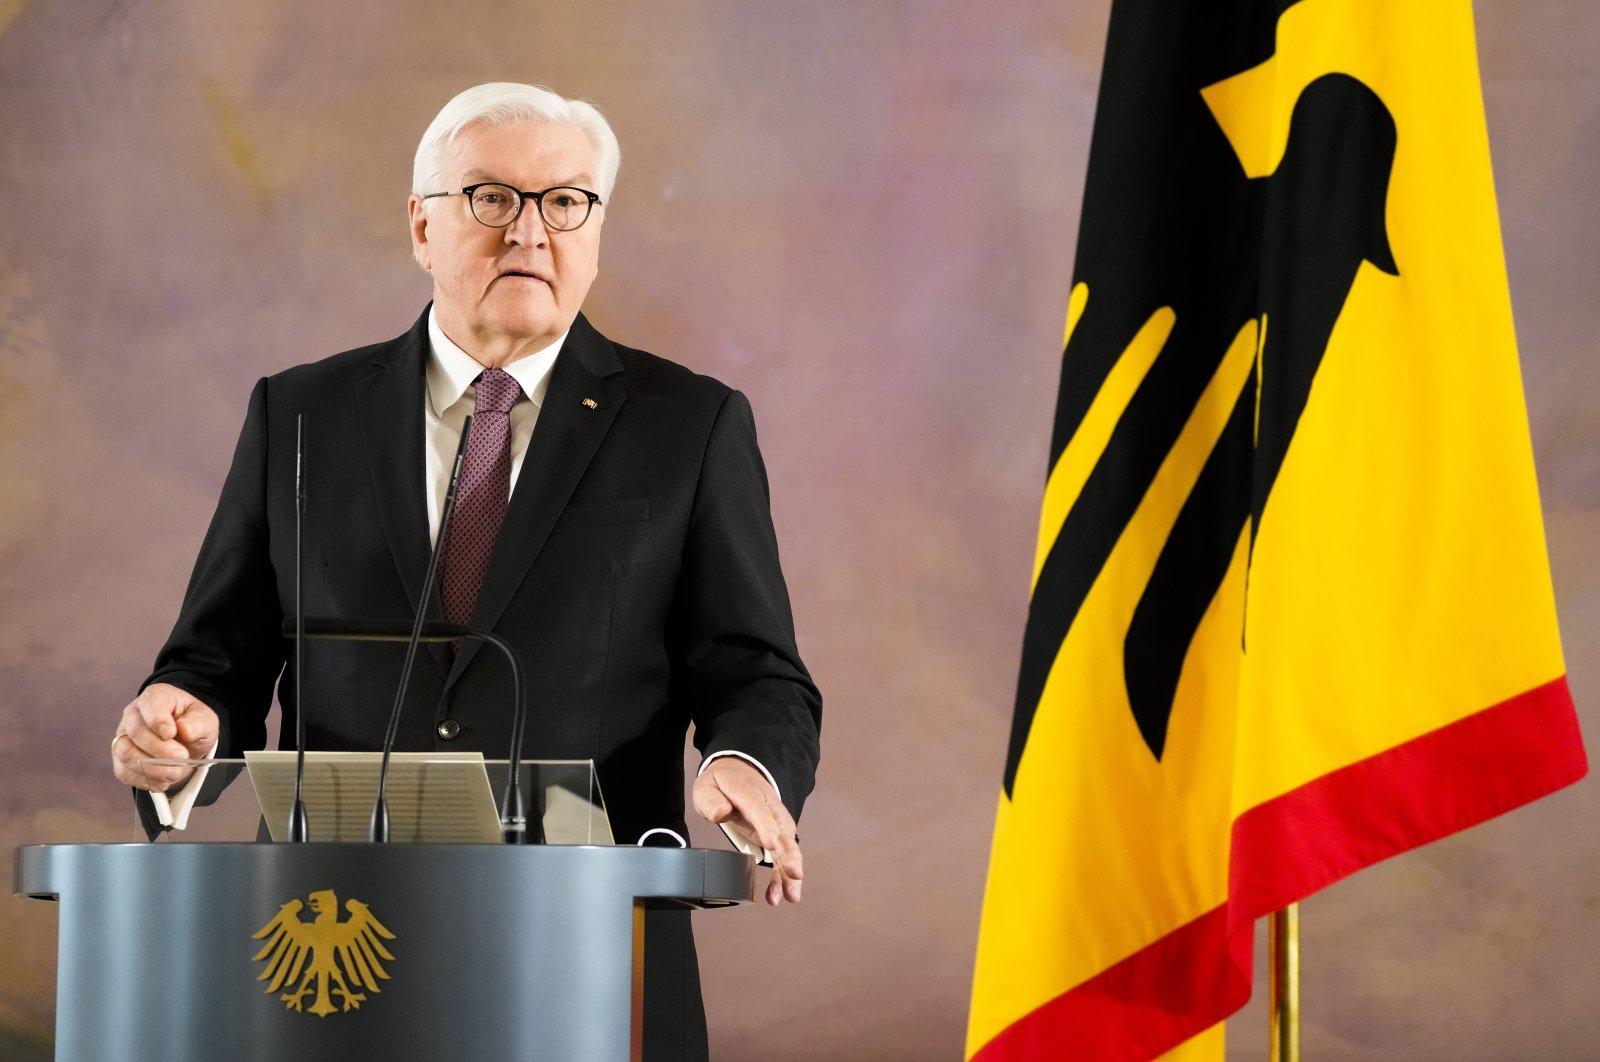 German President Frank-Walter Steinmeier addresses the media at his residence Bellevue Palace in Berlin, Germany, May 28, 2021. (AP Photo)